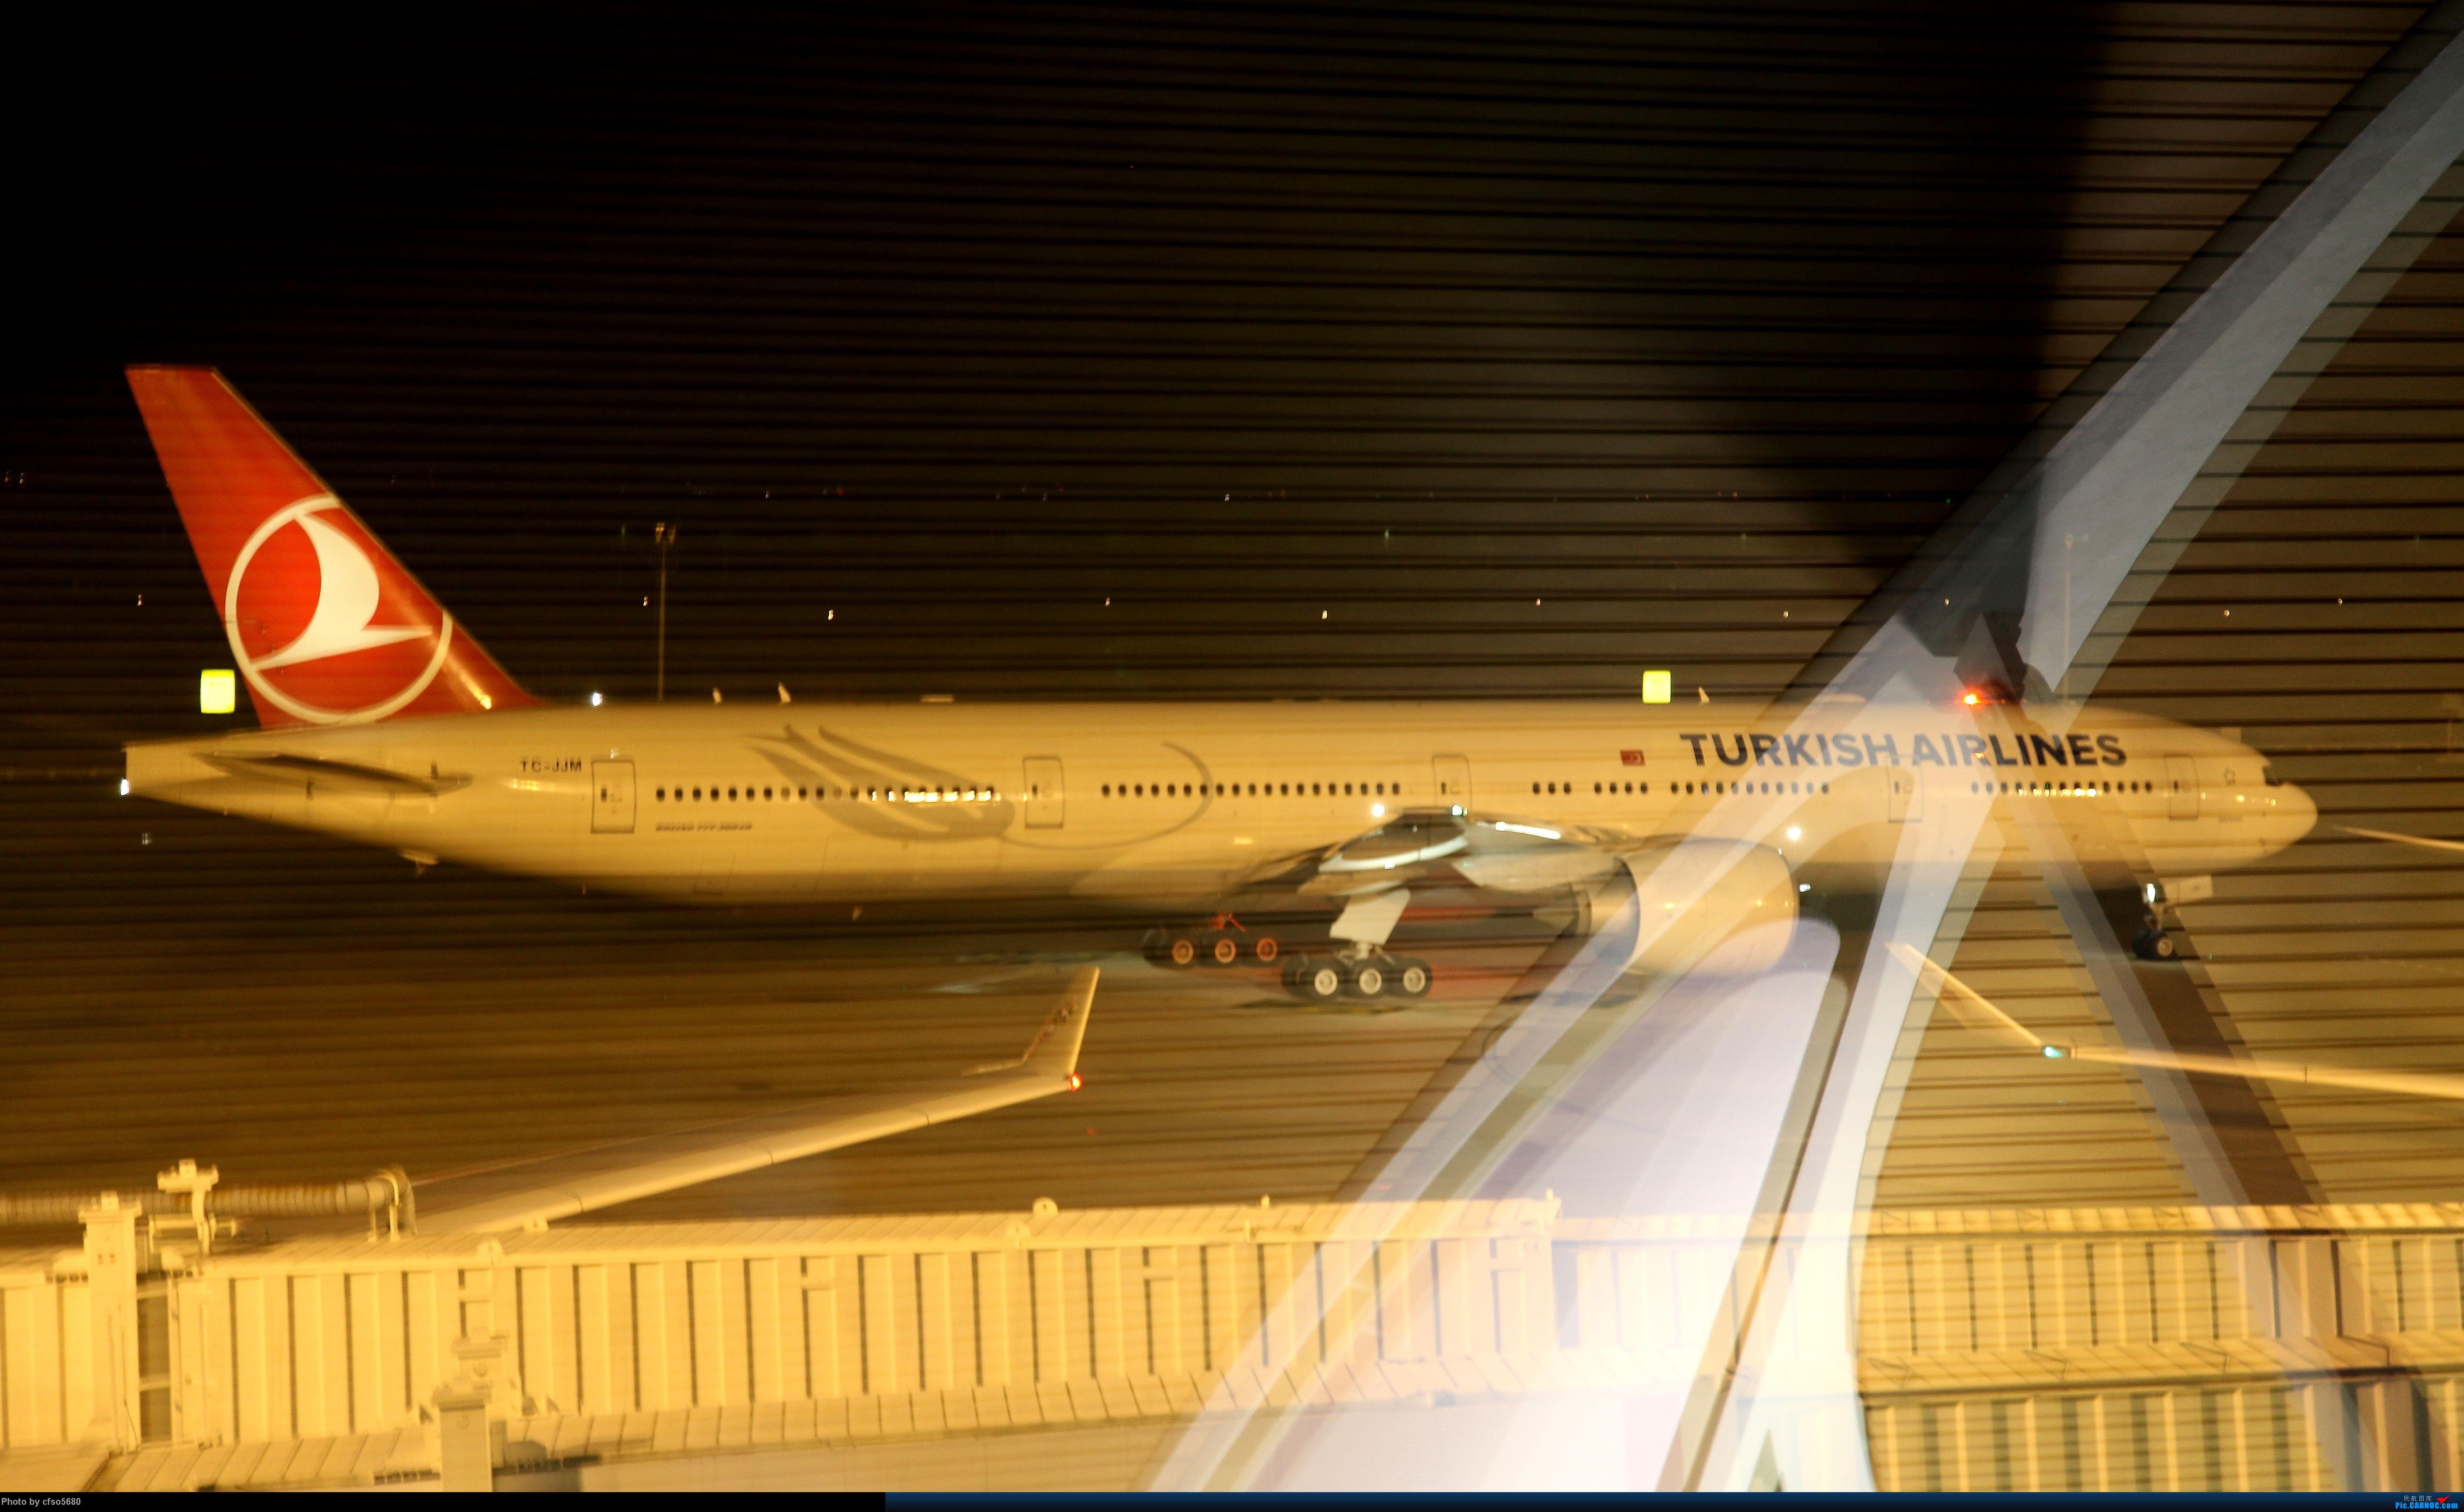 Re:[原创]2013大马拍机之旅,有彩绘、有380,飞机多多,惊喜多多。 BOEING 777-300 TC-JJM PEK